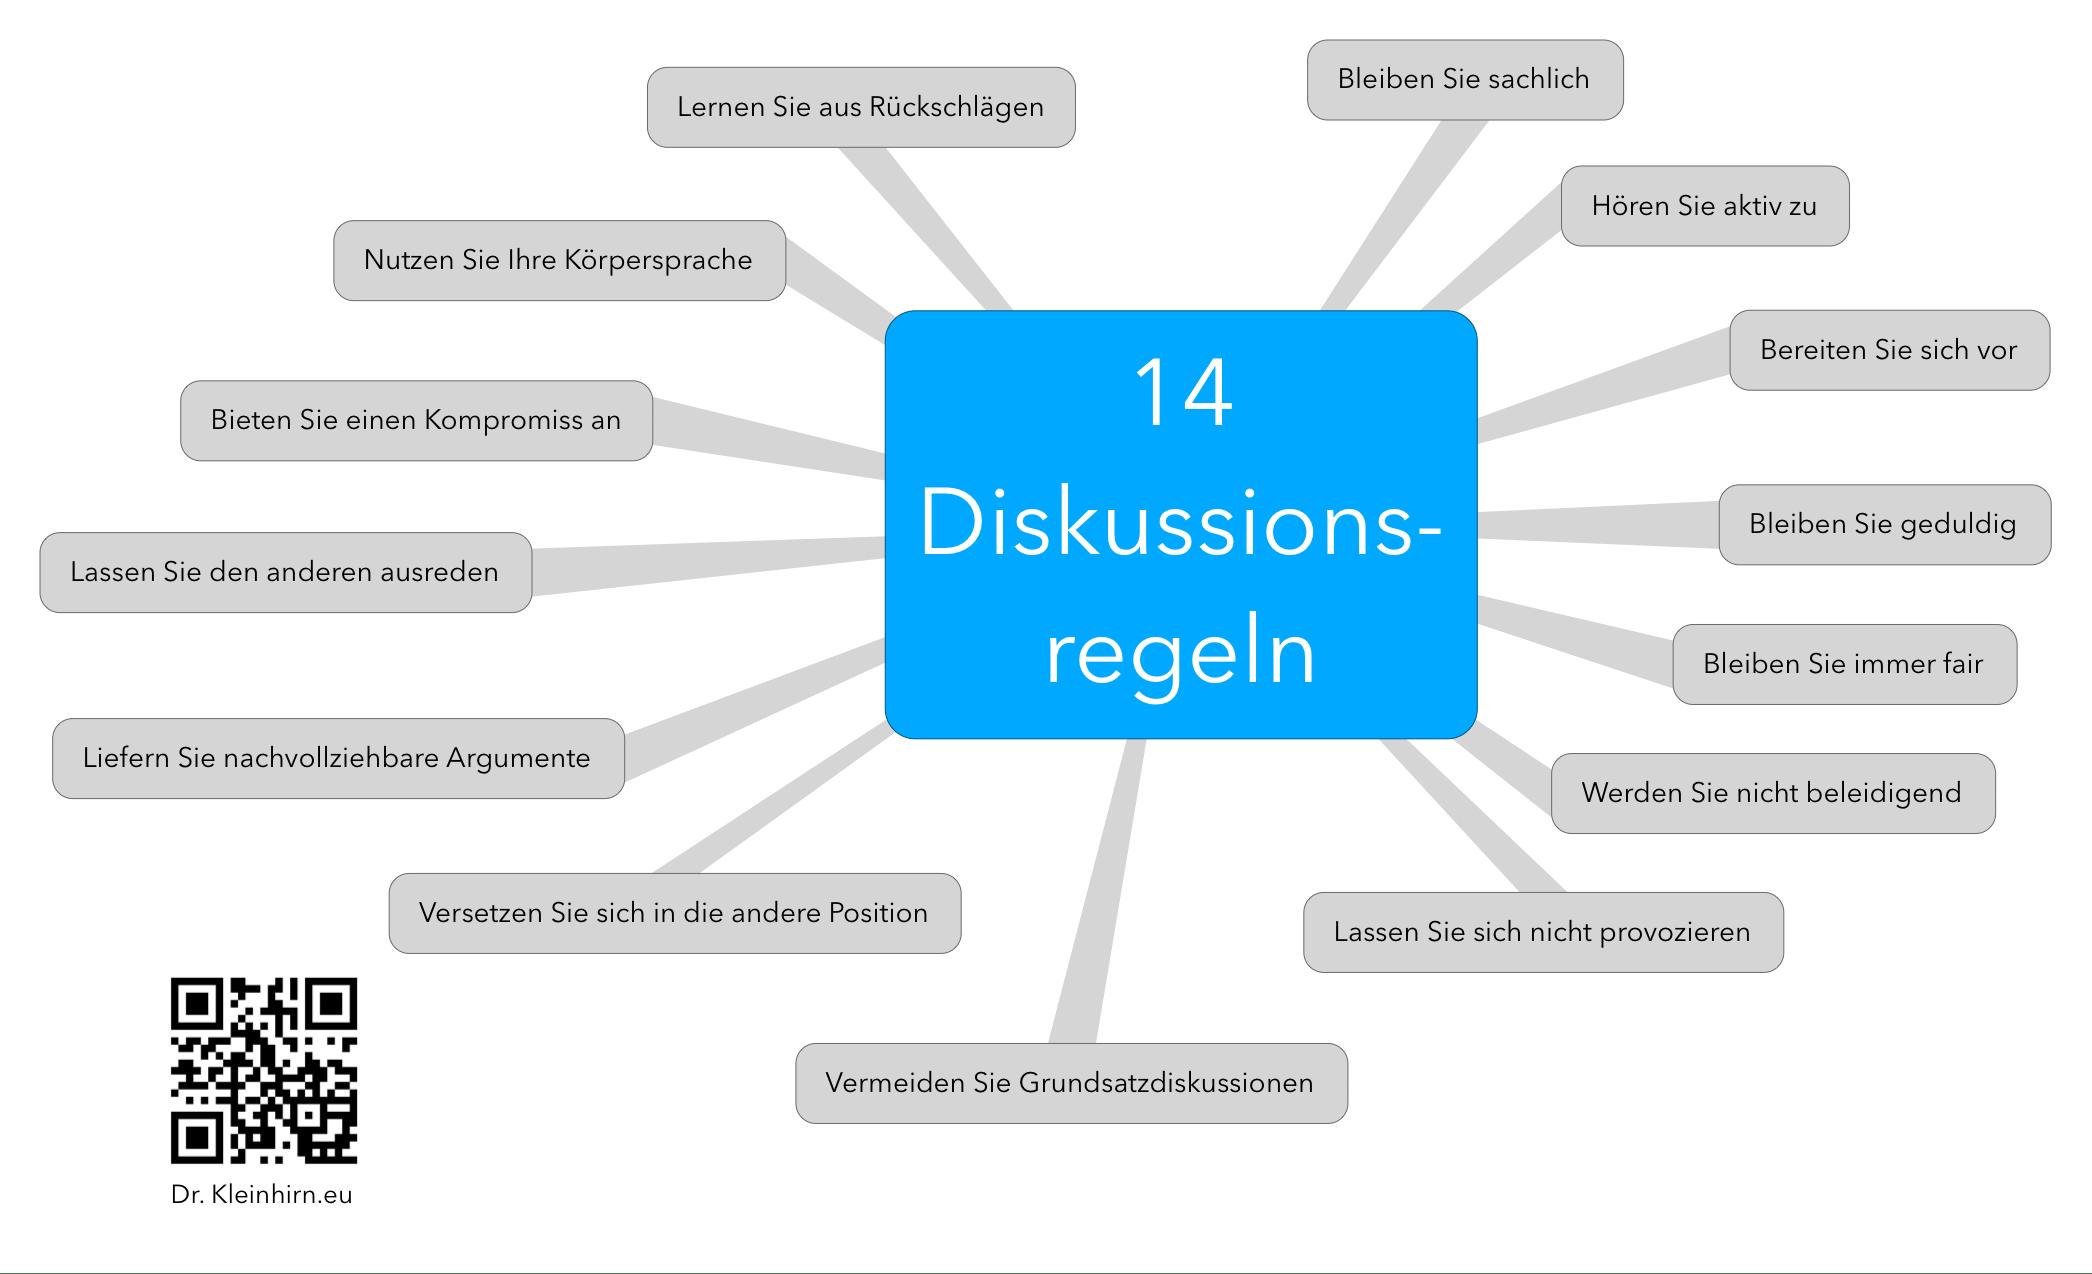 diskussionsregeln diskussion reden retorik